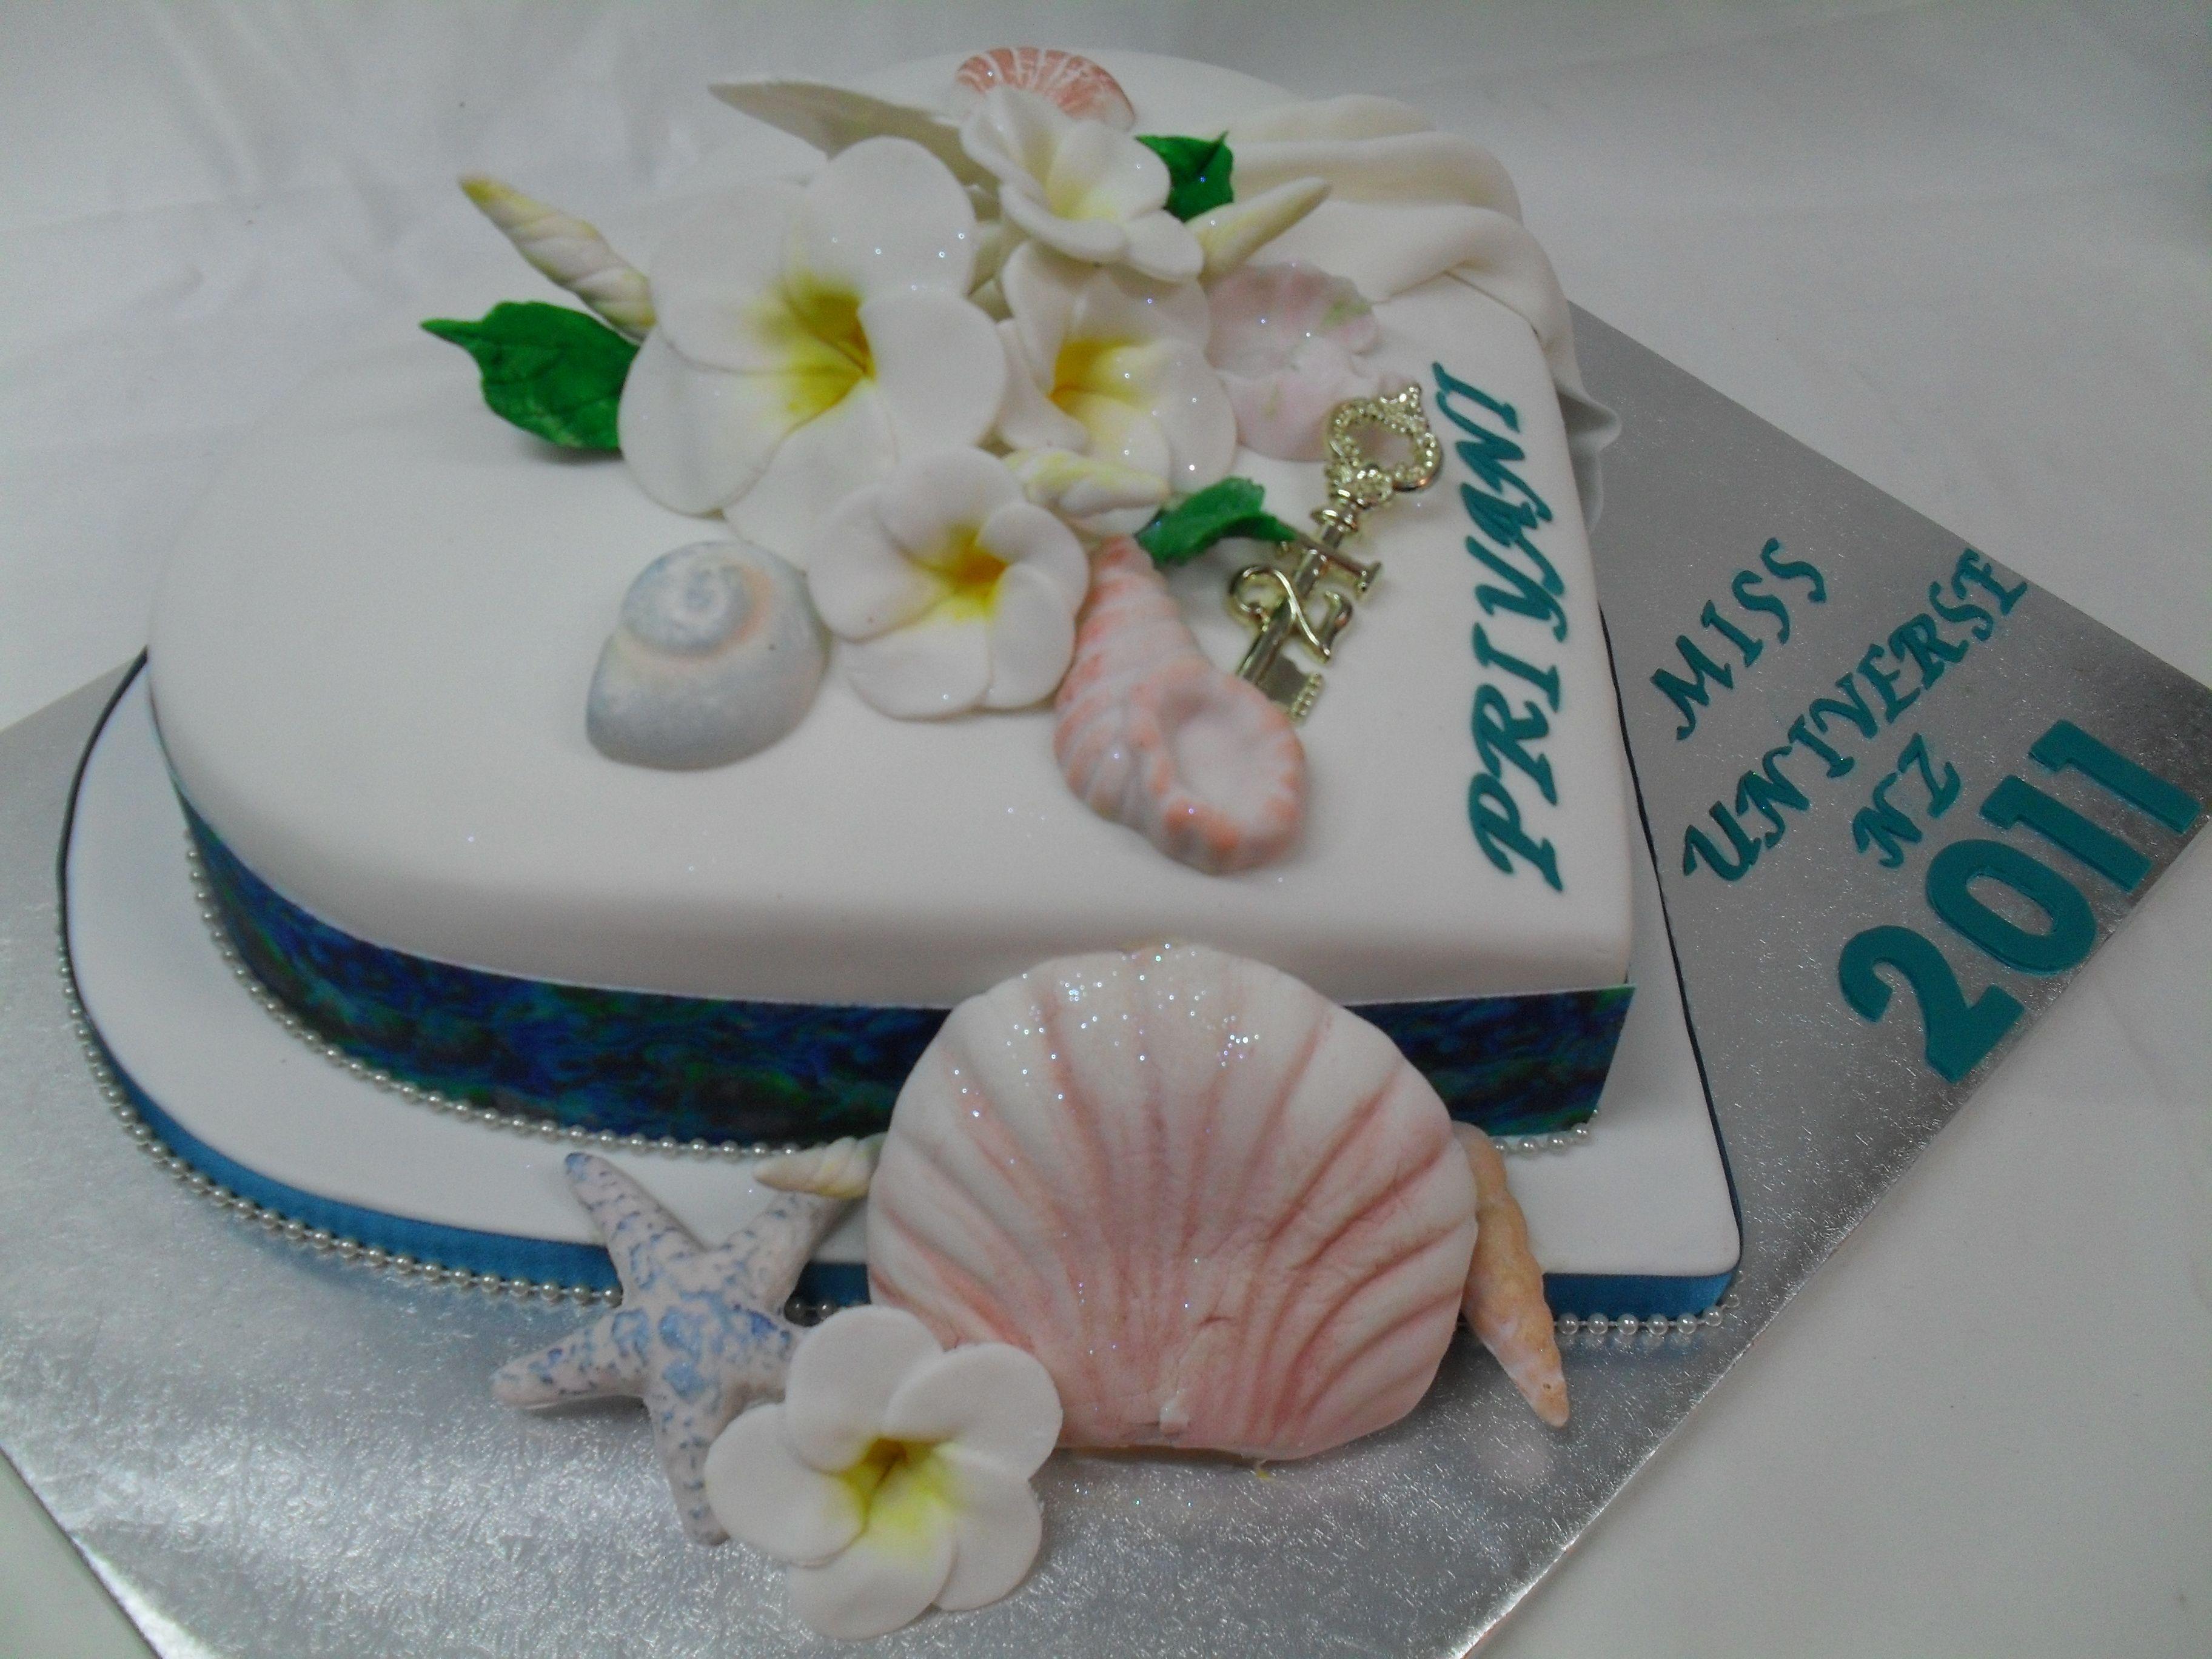 Edible Cake Images New Zealand : Beautiful heart shaped cake with edible Paua shell ribbon ...